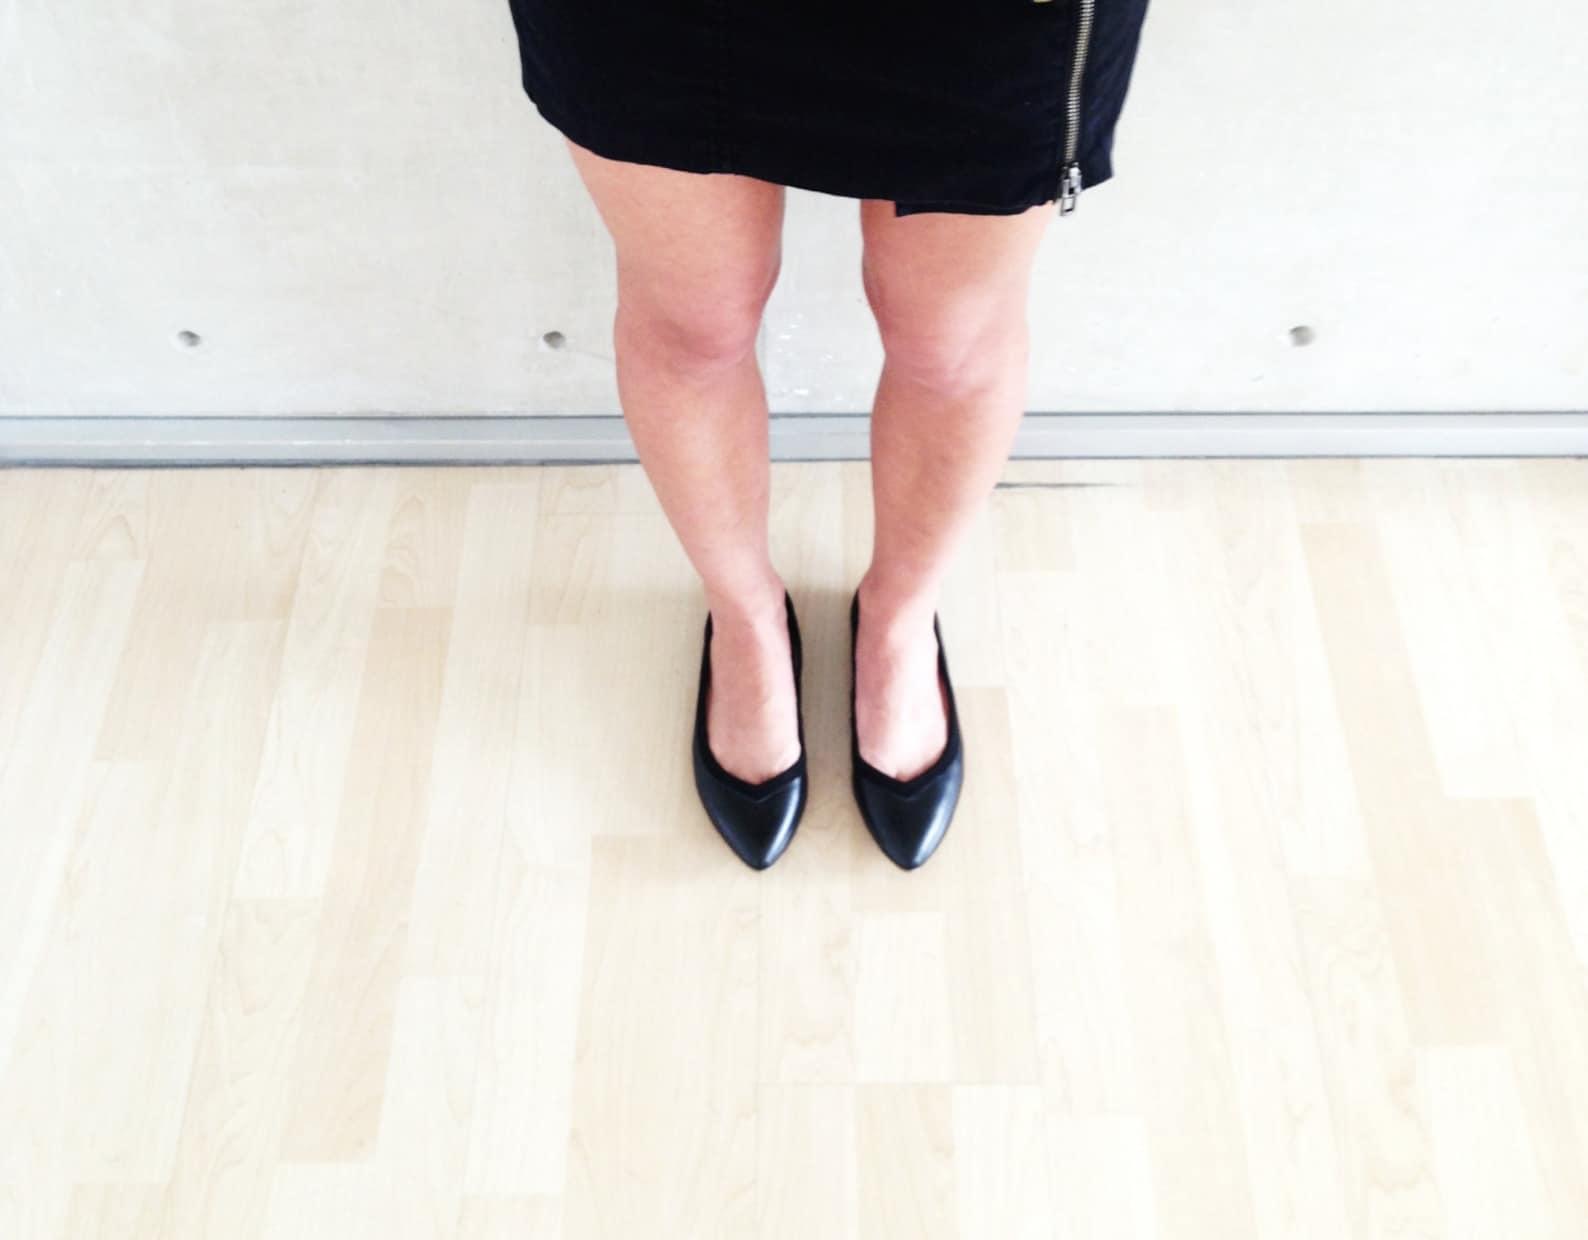 on sale! vegan black ballet flats // full black noir // pointed sexy elegant flats - from 60 to 30dls